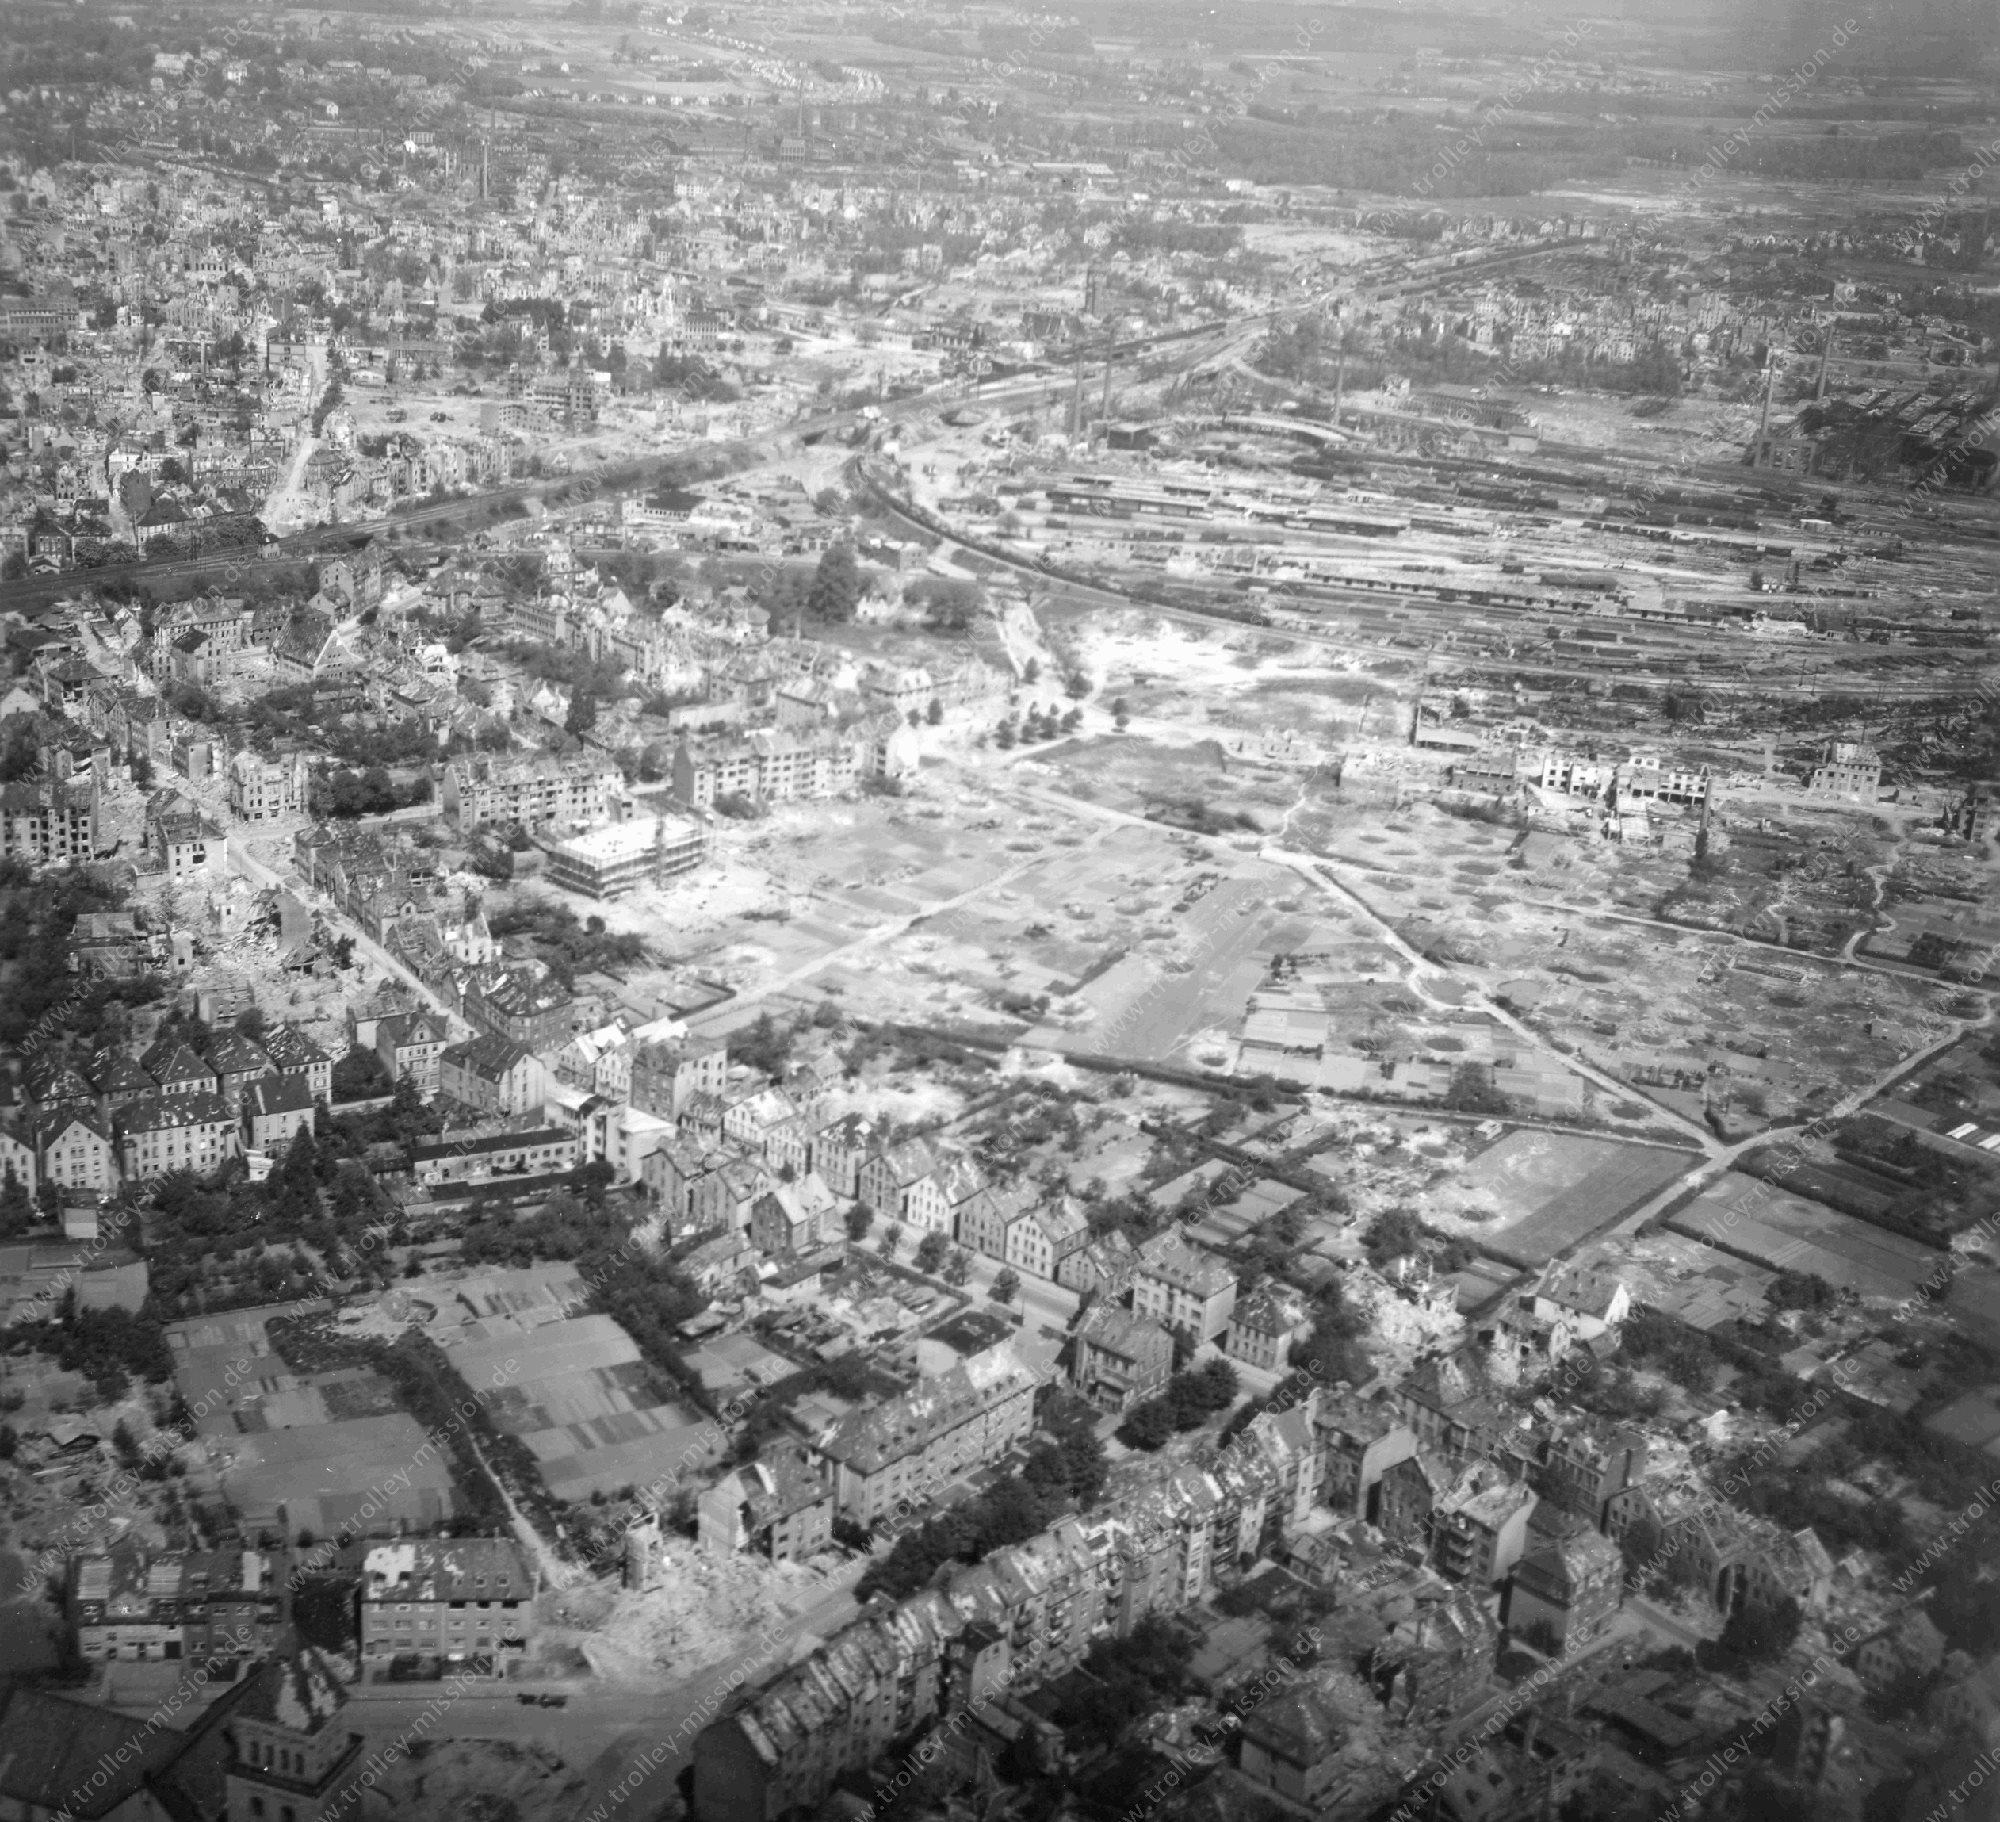 Luftbild vom Rangierbahnhof bzw. Güterbahnhof in Osnabrück im Mai 1945